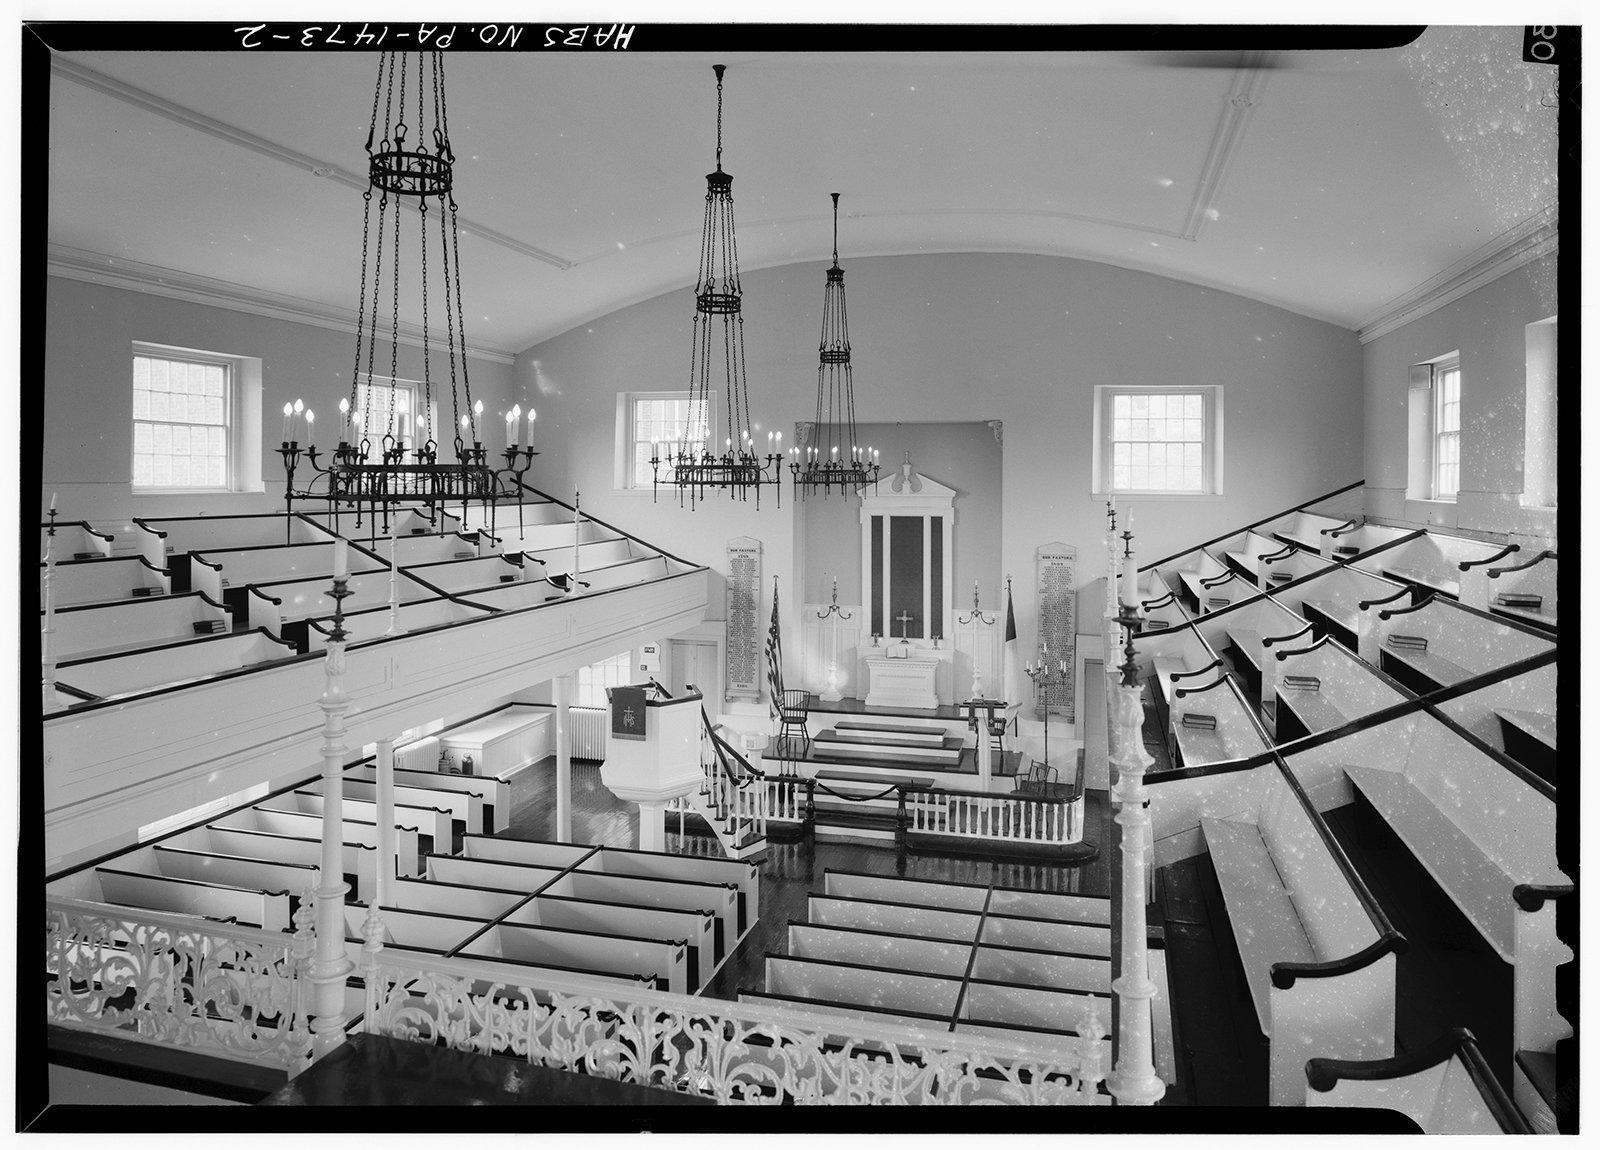 Interior of Historic St. George's United Methodist Church in Philadelphia. Photo courtesy of LOC/Creative Commons